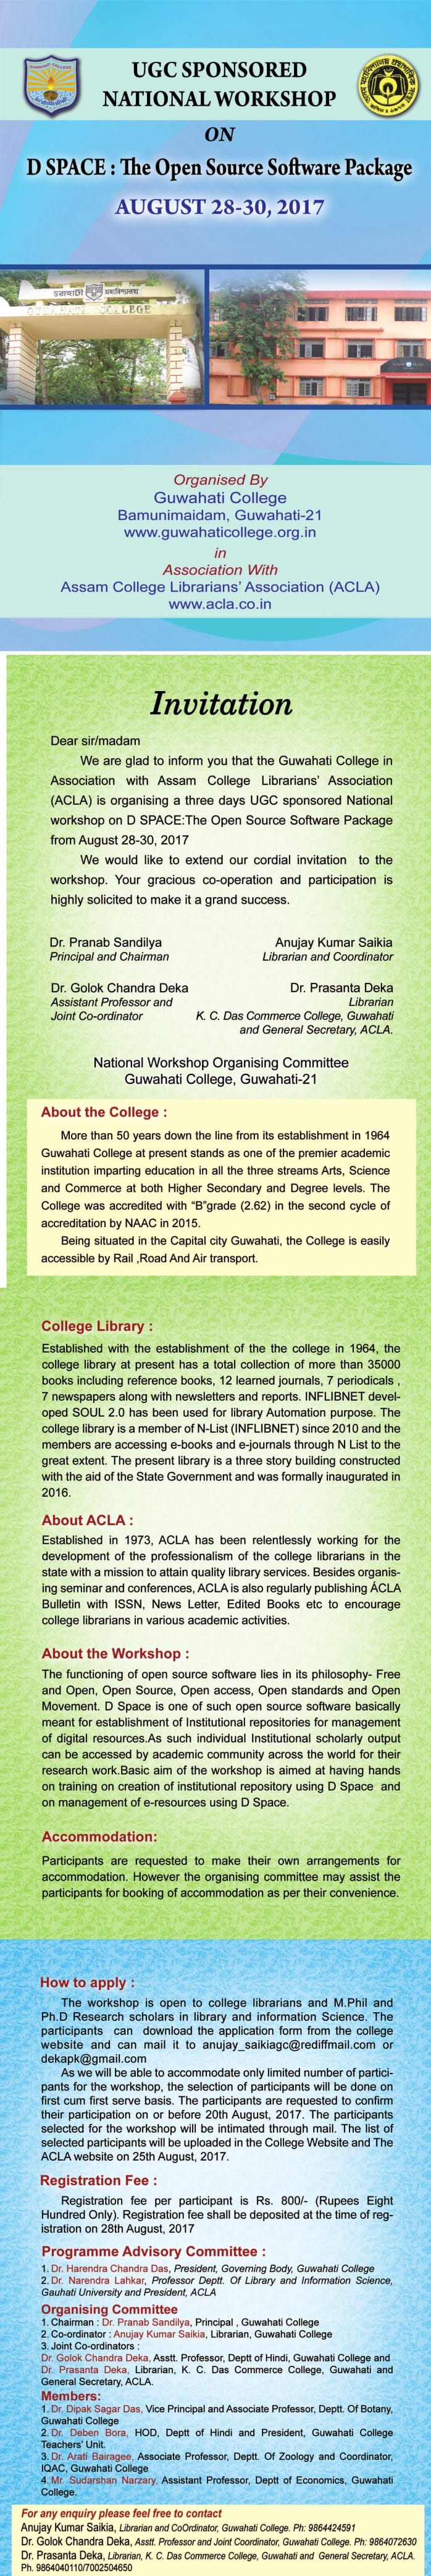 brochure_UGC-1.jpg